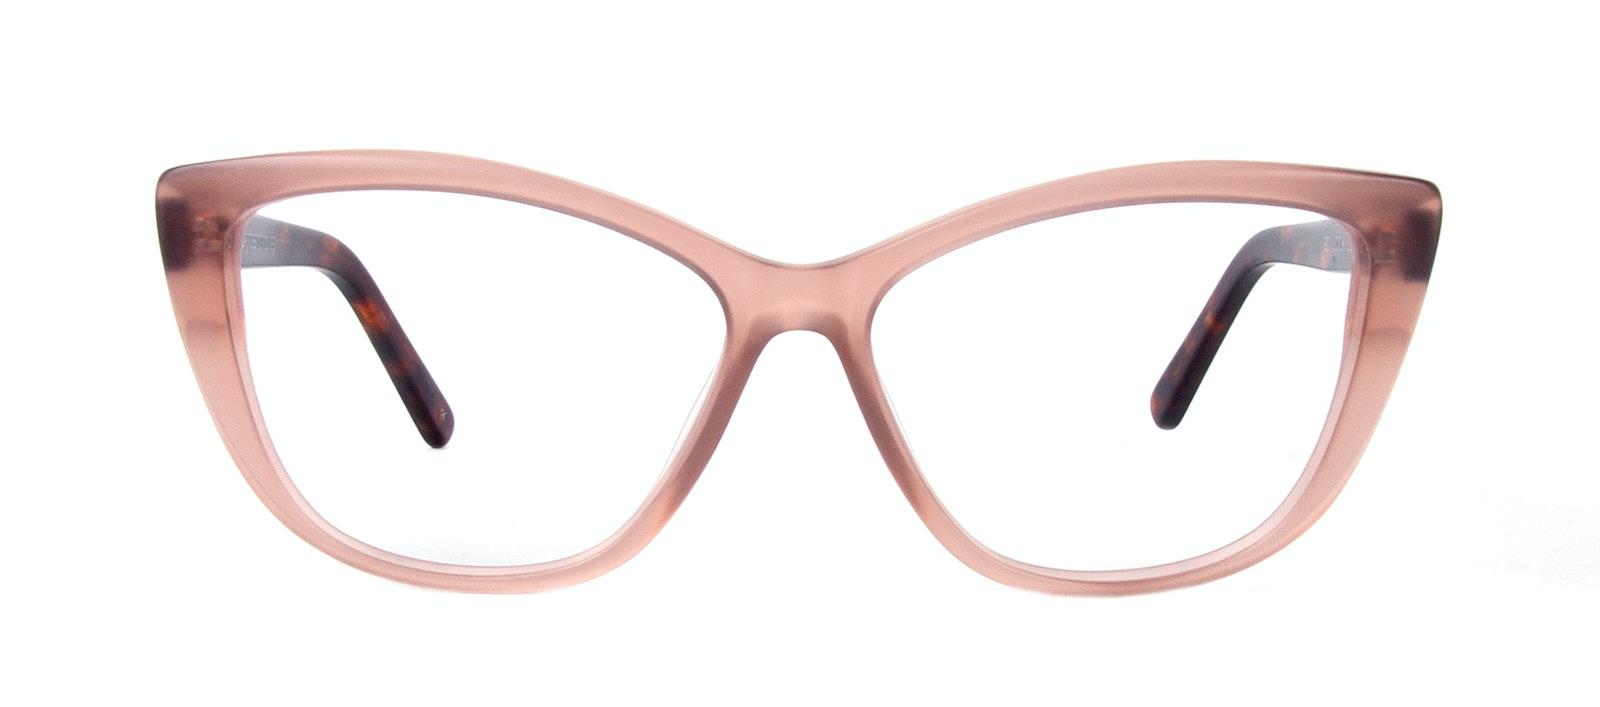 31d6e0314671 ... Affordable Fashion Glasses Cat Eye Daring Cateye Eyeglasses Women  Dolled Up Rose Tortoise Matte Front ...